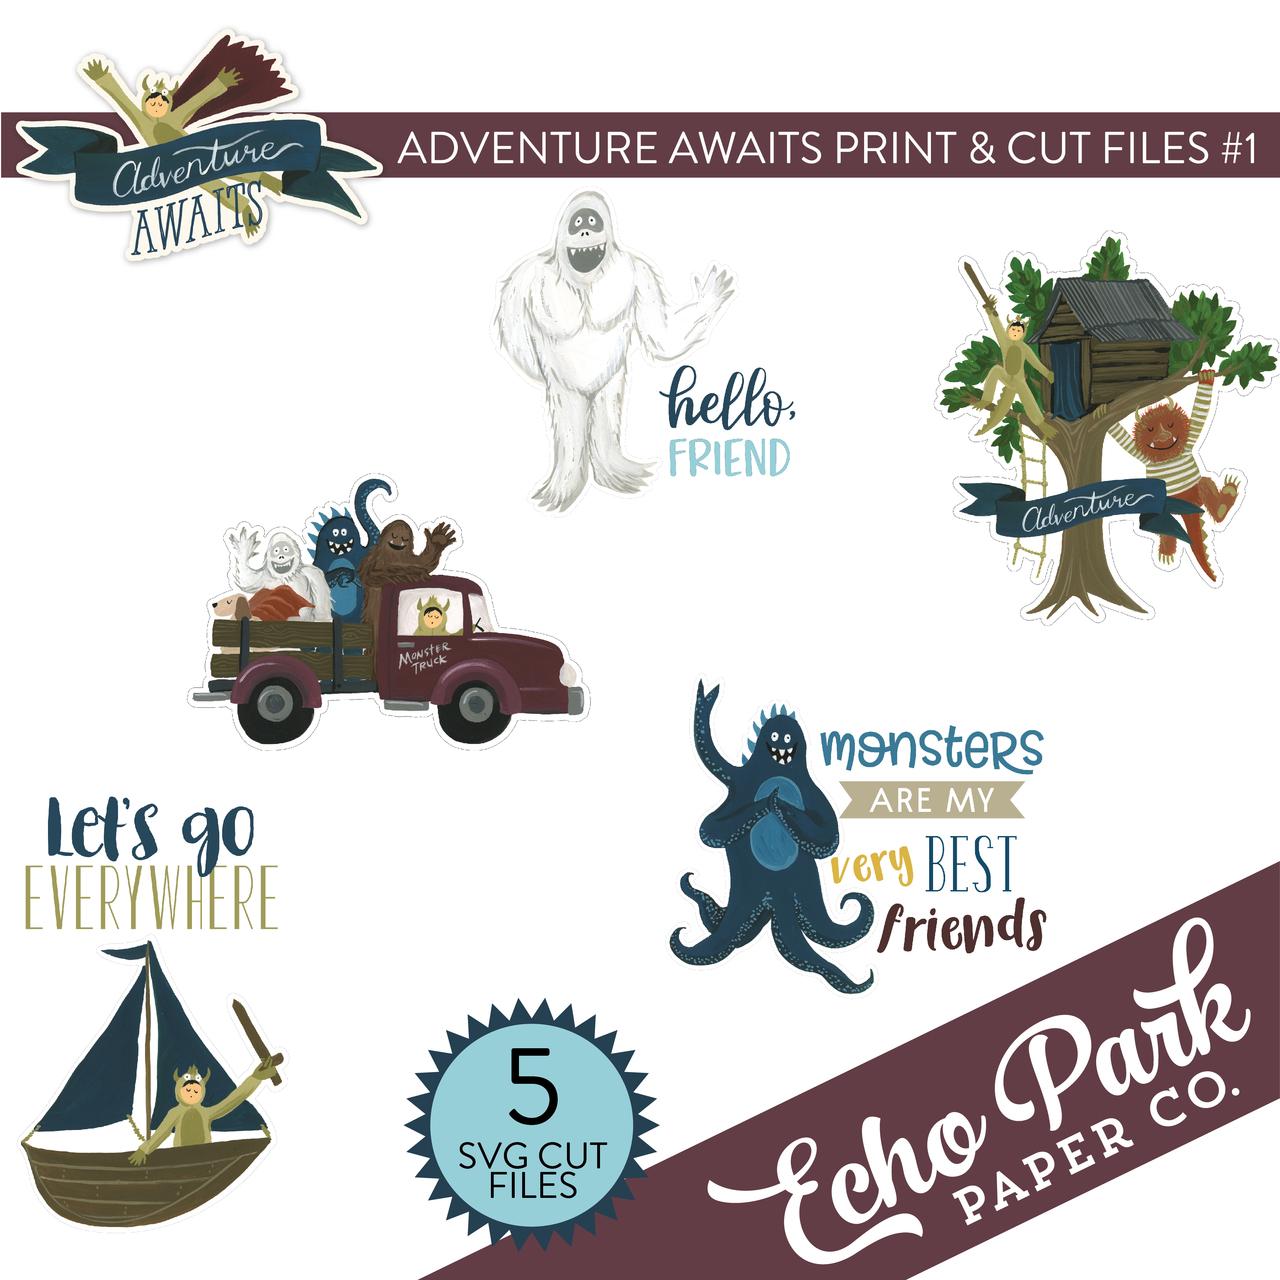 Adventure Awaits Print & Cut Files #1